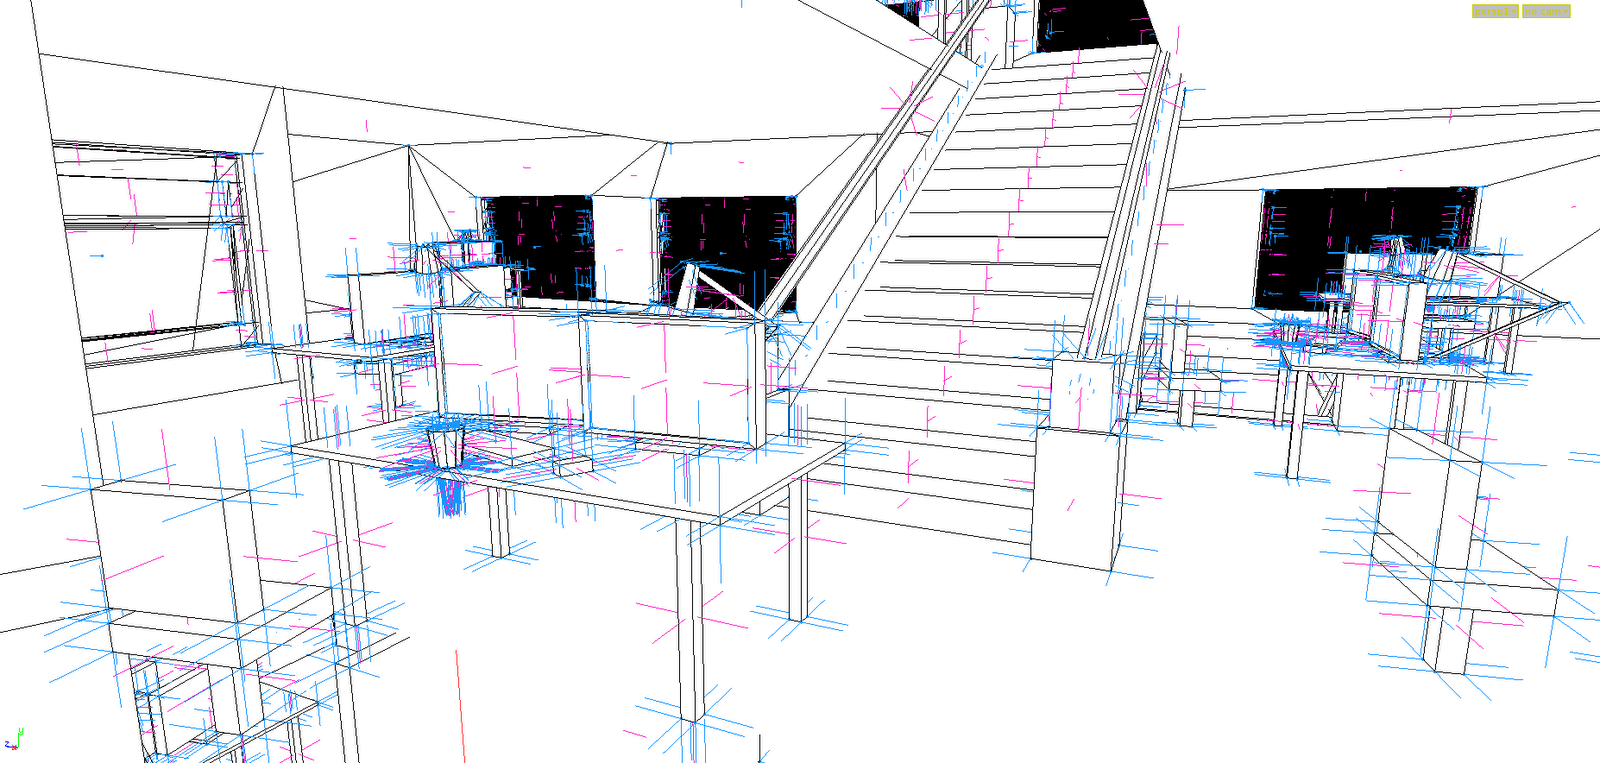 procedural interiors and building design  | Freek Hoekstra